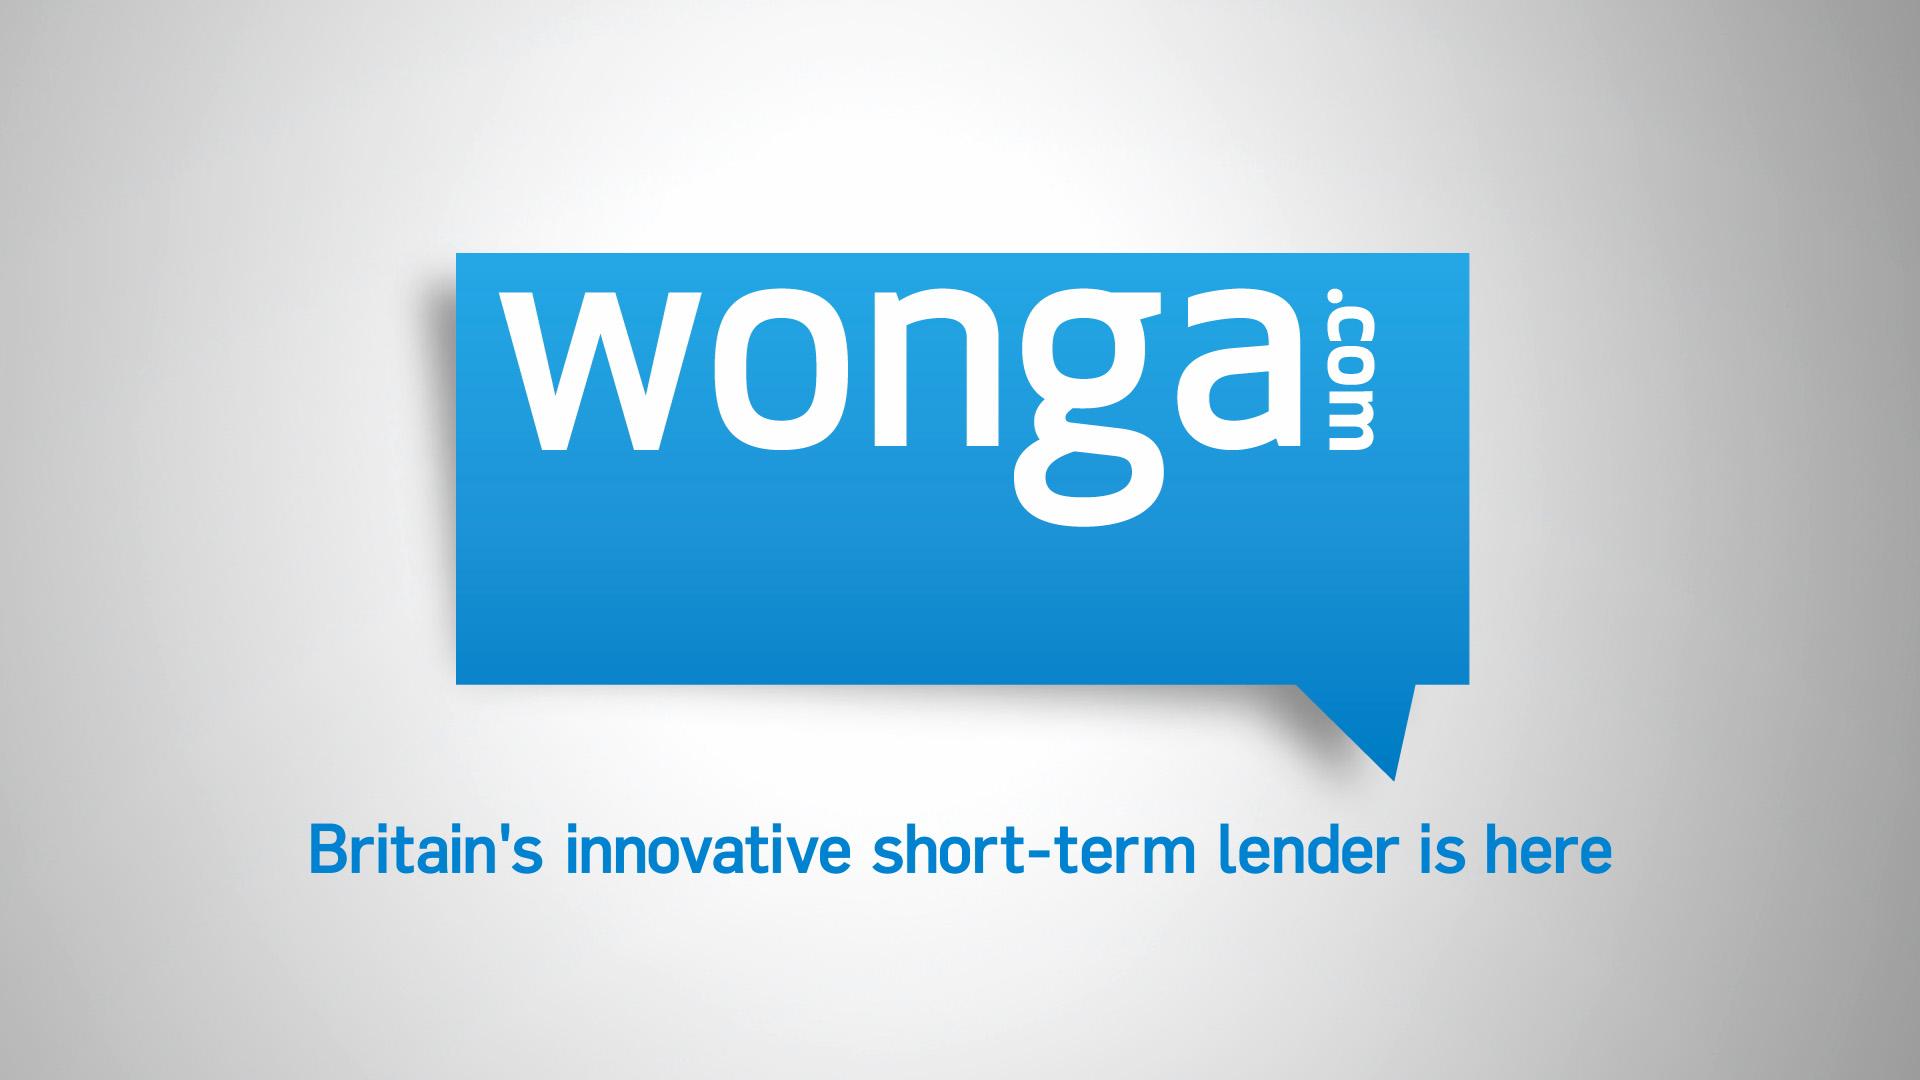 wonga_intern_image03